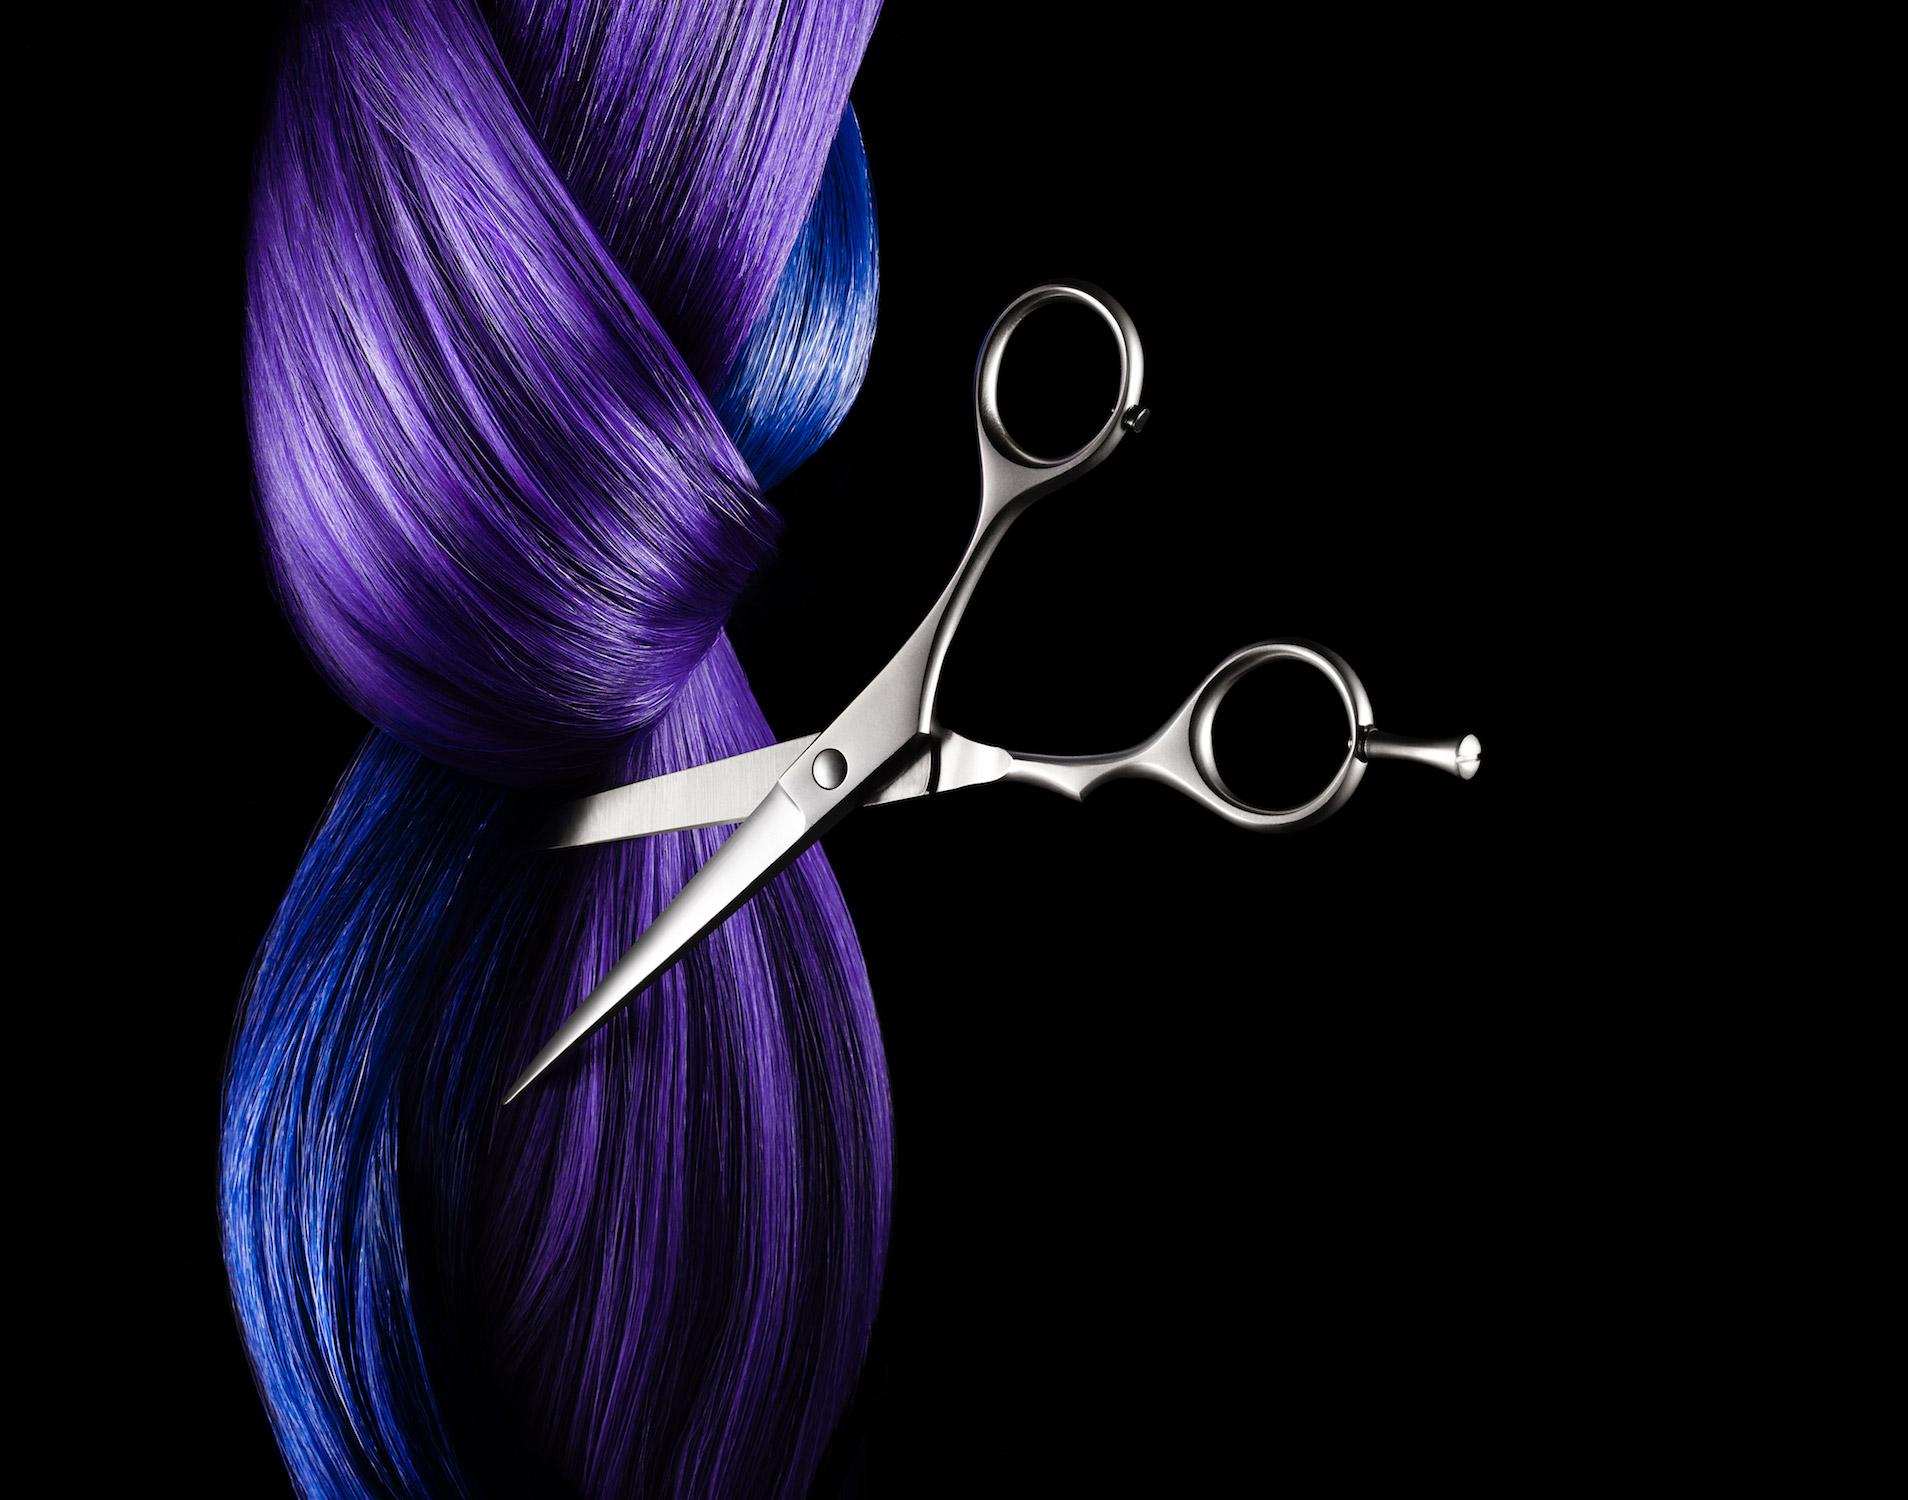 hair scissors wallpaper - photo #32